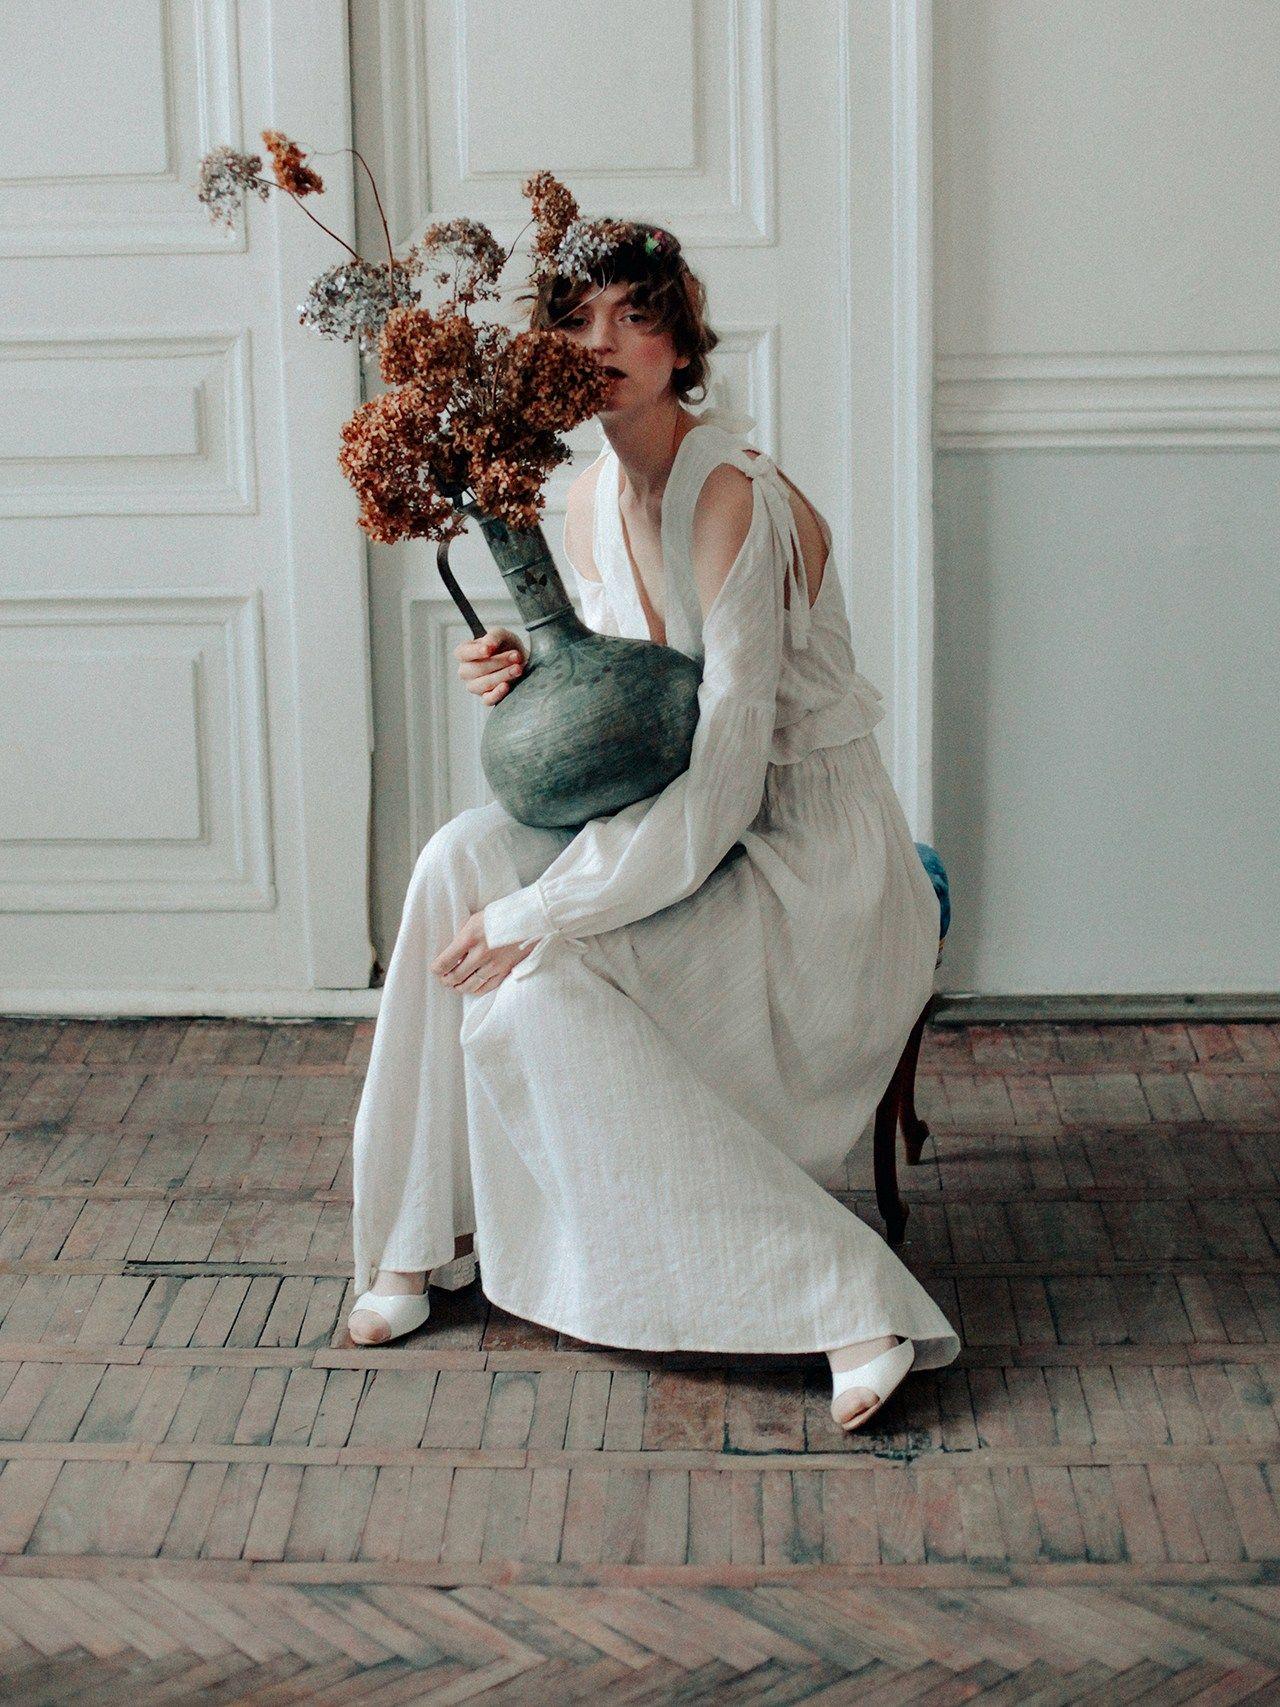 ATLAS MAGAZINE // theatlasmagazine.com #fashion #editorial #fashioneditorial #photoshoot #model #photography #fashionstyling